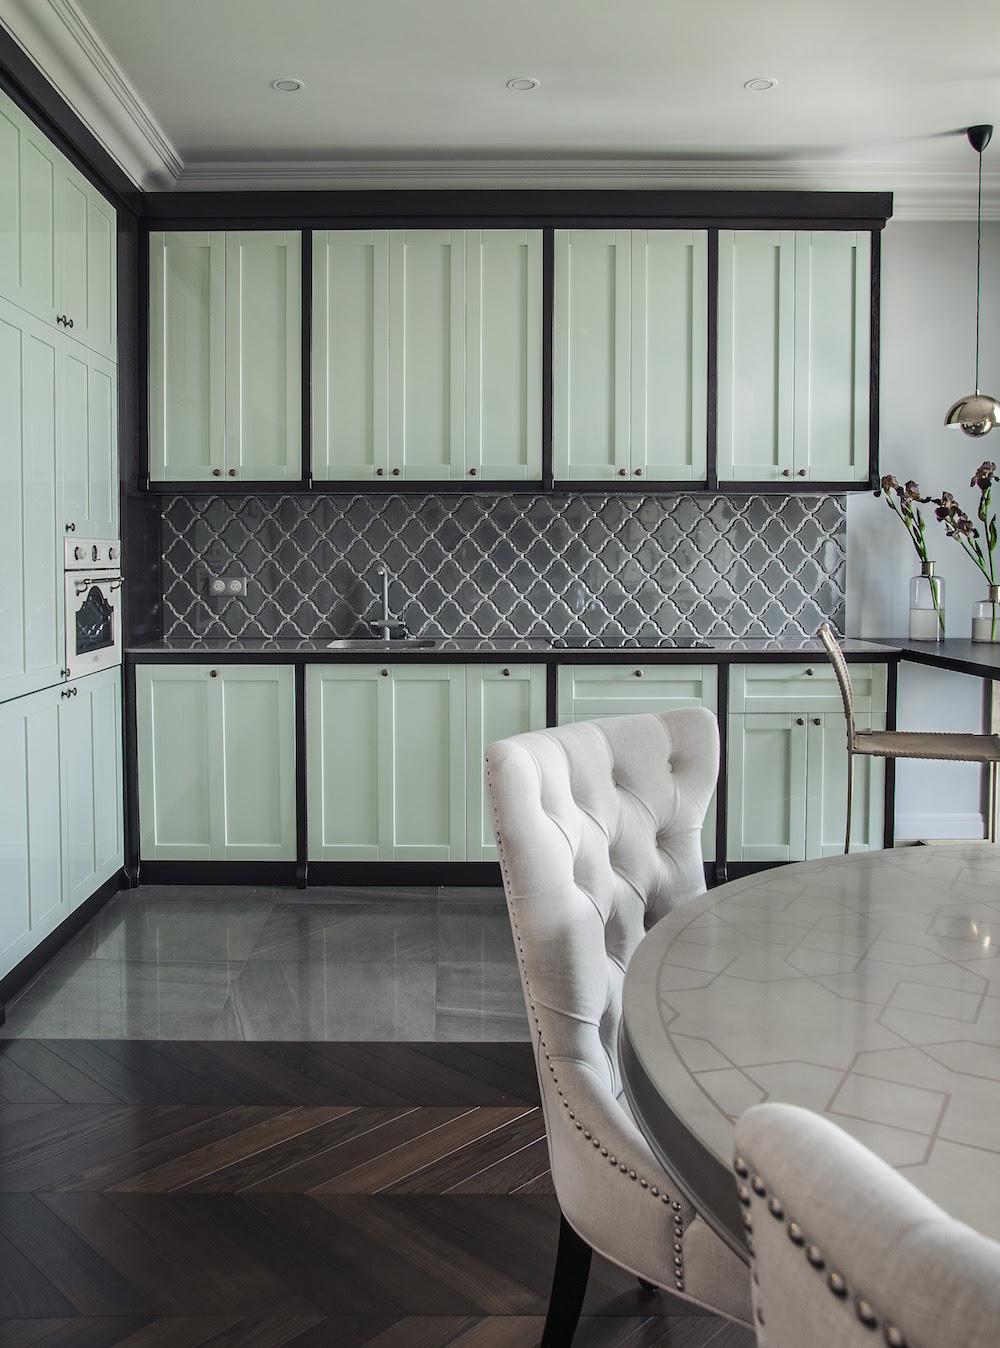 Art decor apartment kitchen furniture